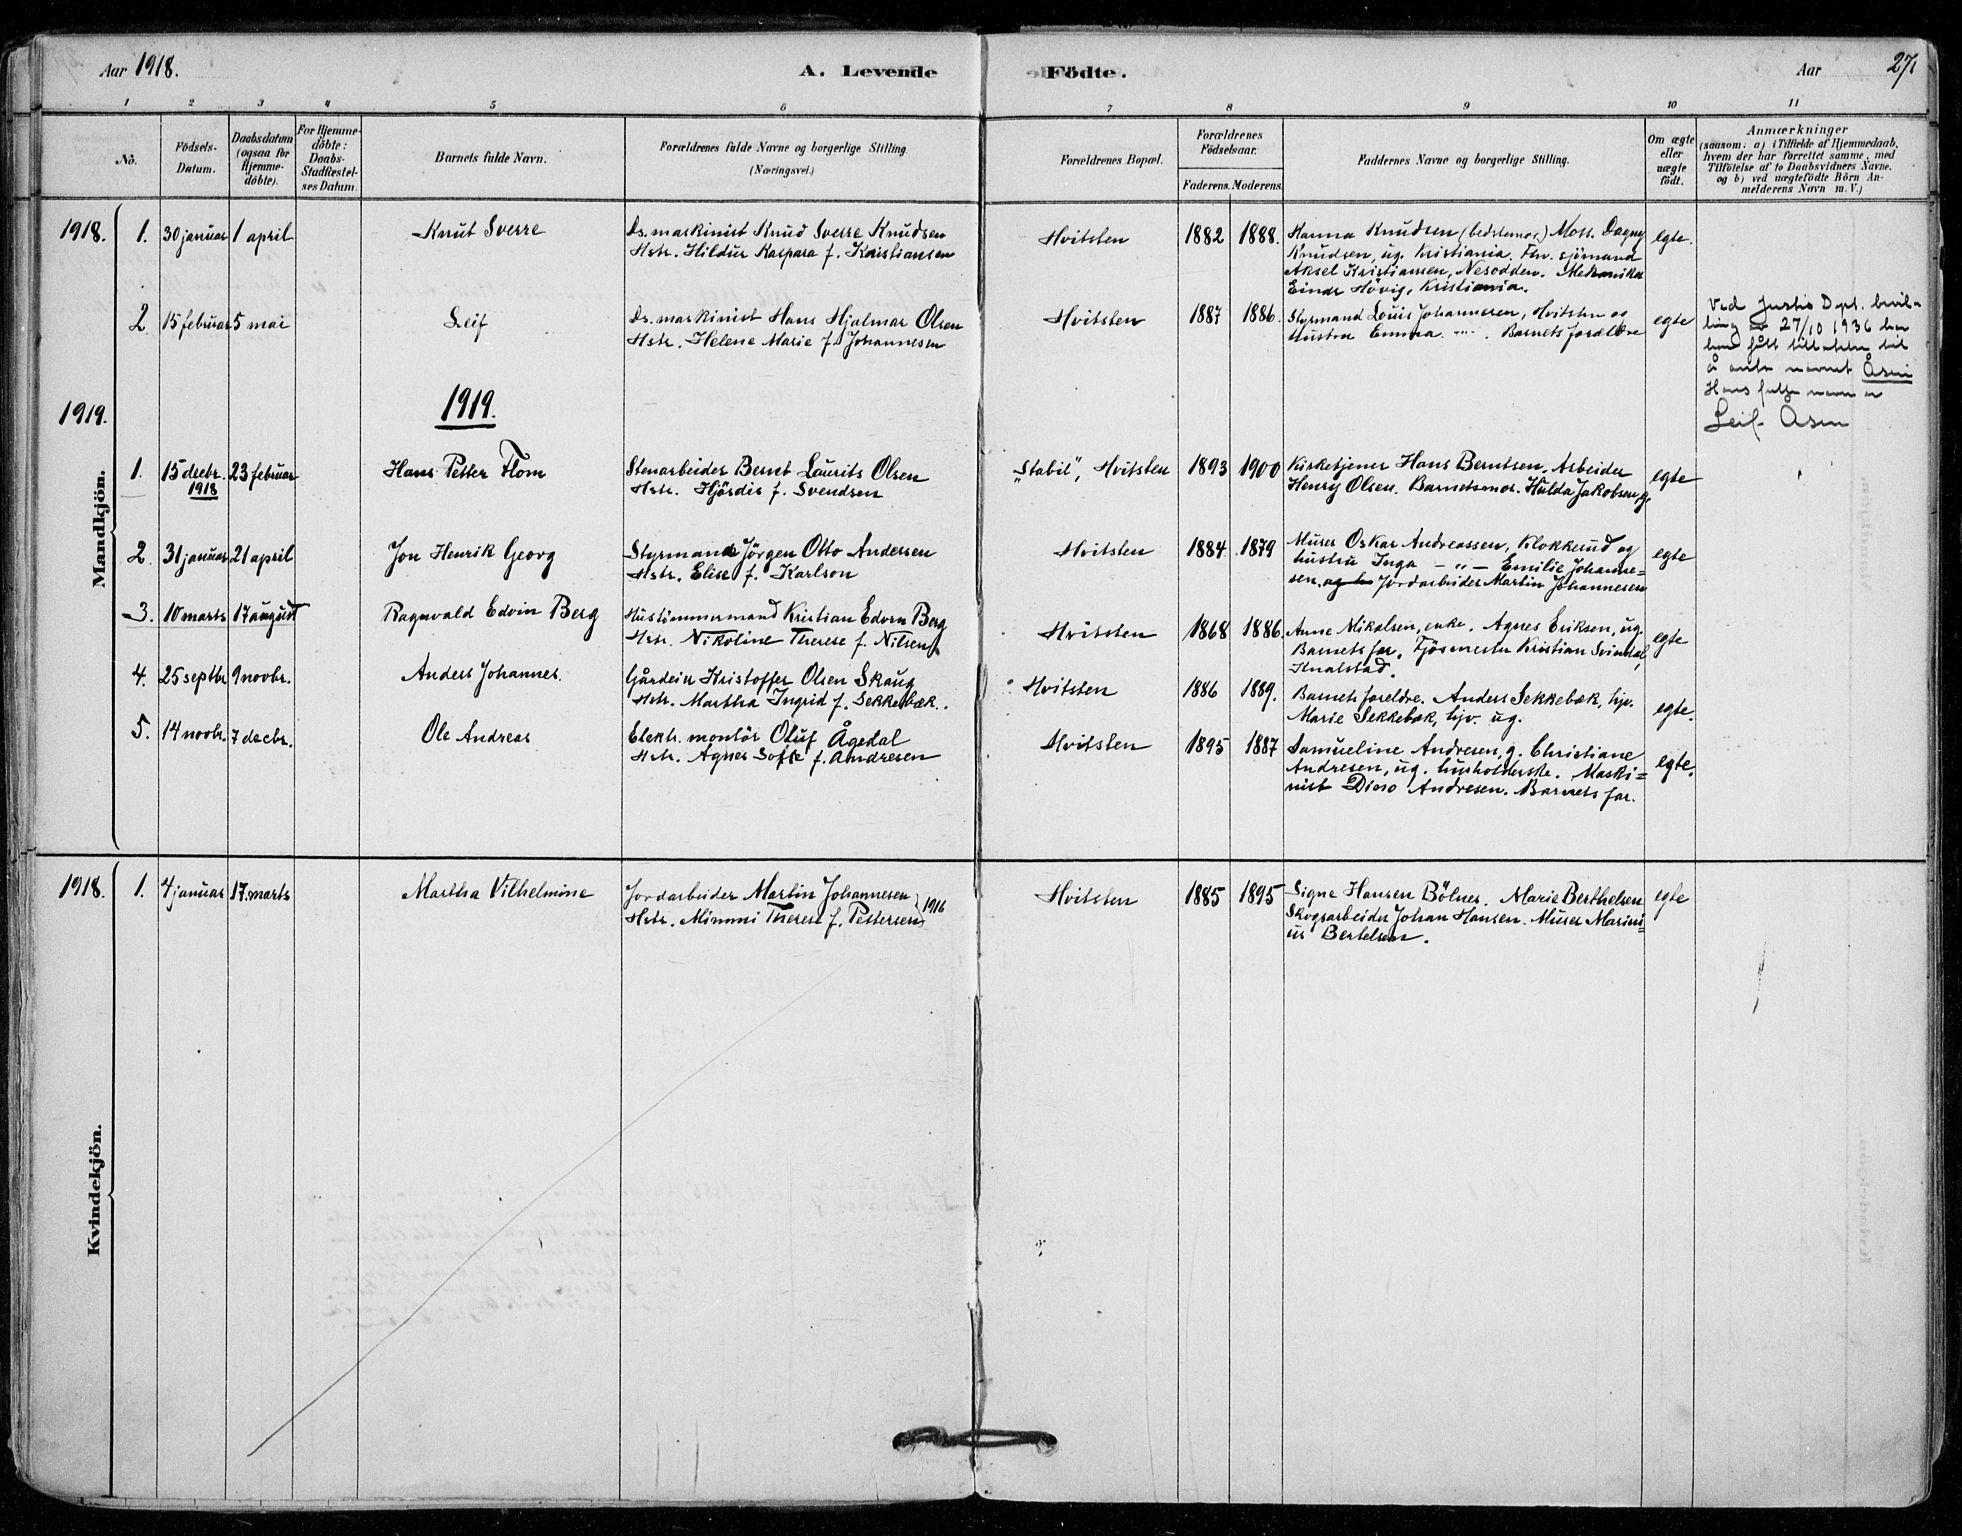 SAO, Vestby prestekontor Kirkebøker, F/Fd/L0001: Ministerialbok nr. IV 1, 1878-1945, s. 27